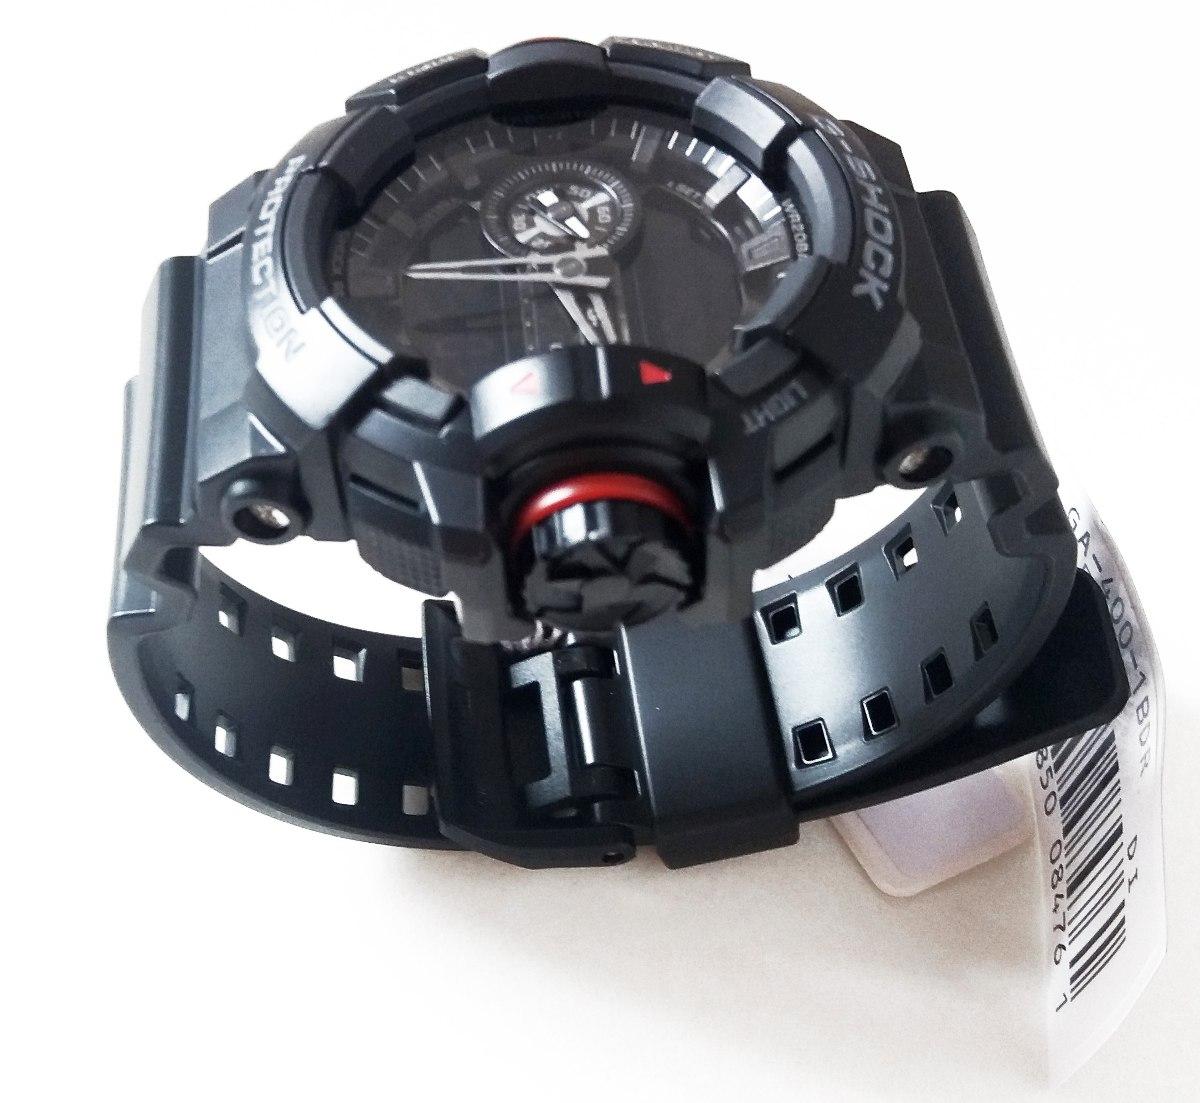 c9c675ba44c relógio g-shock ga-400 casio todo preto vidro mineral. Carregando zoom.